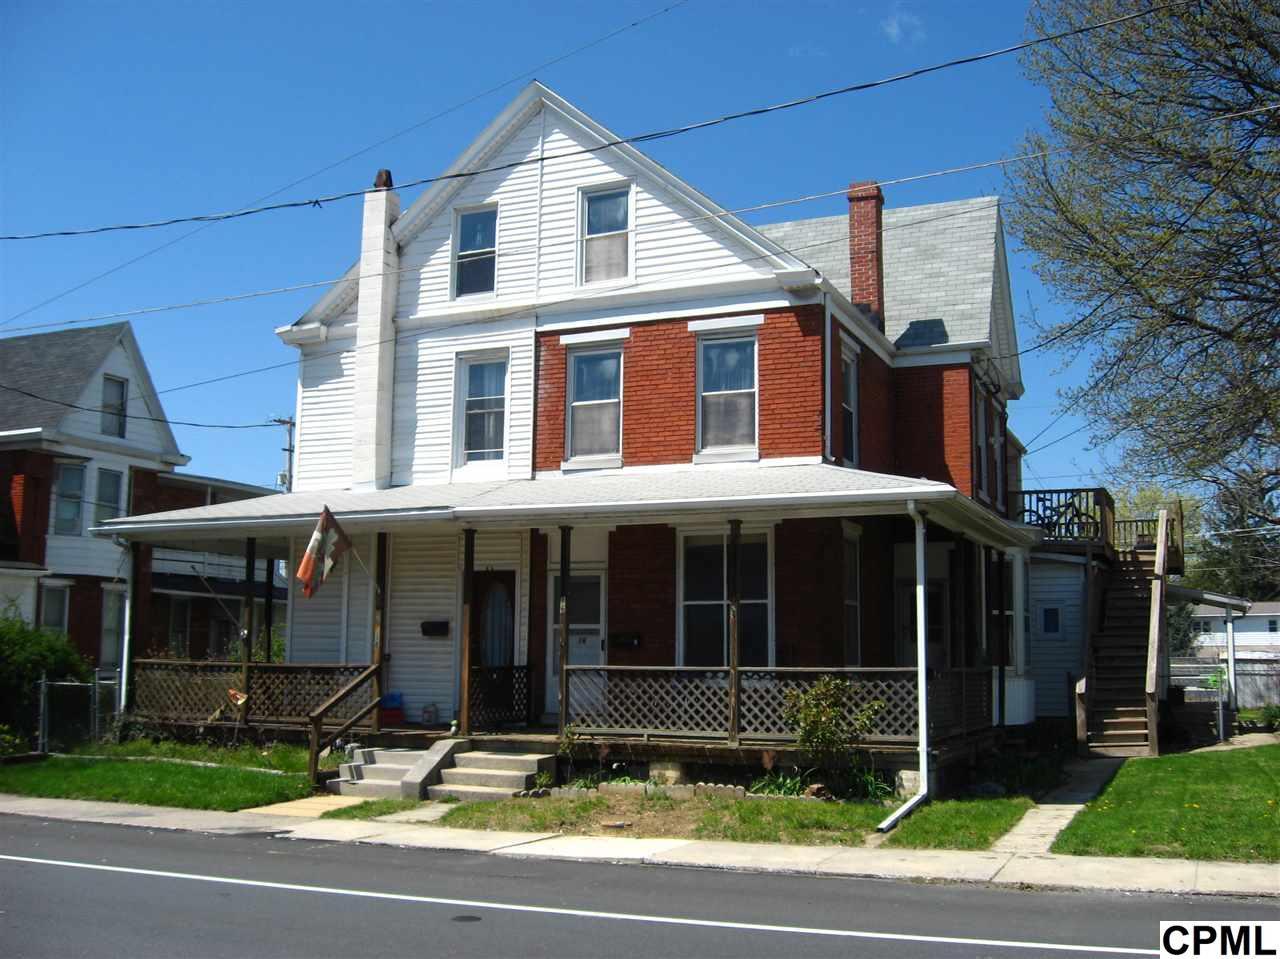 16 Hummel Ave, Camp Hill, PA 17011